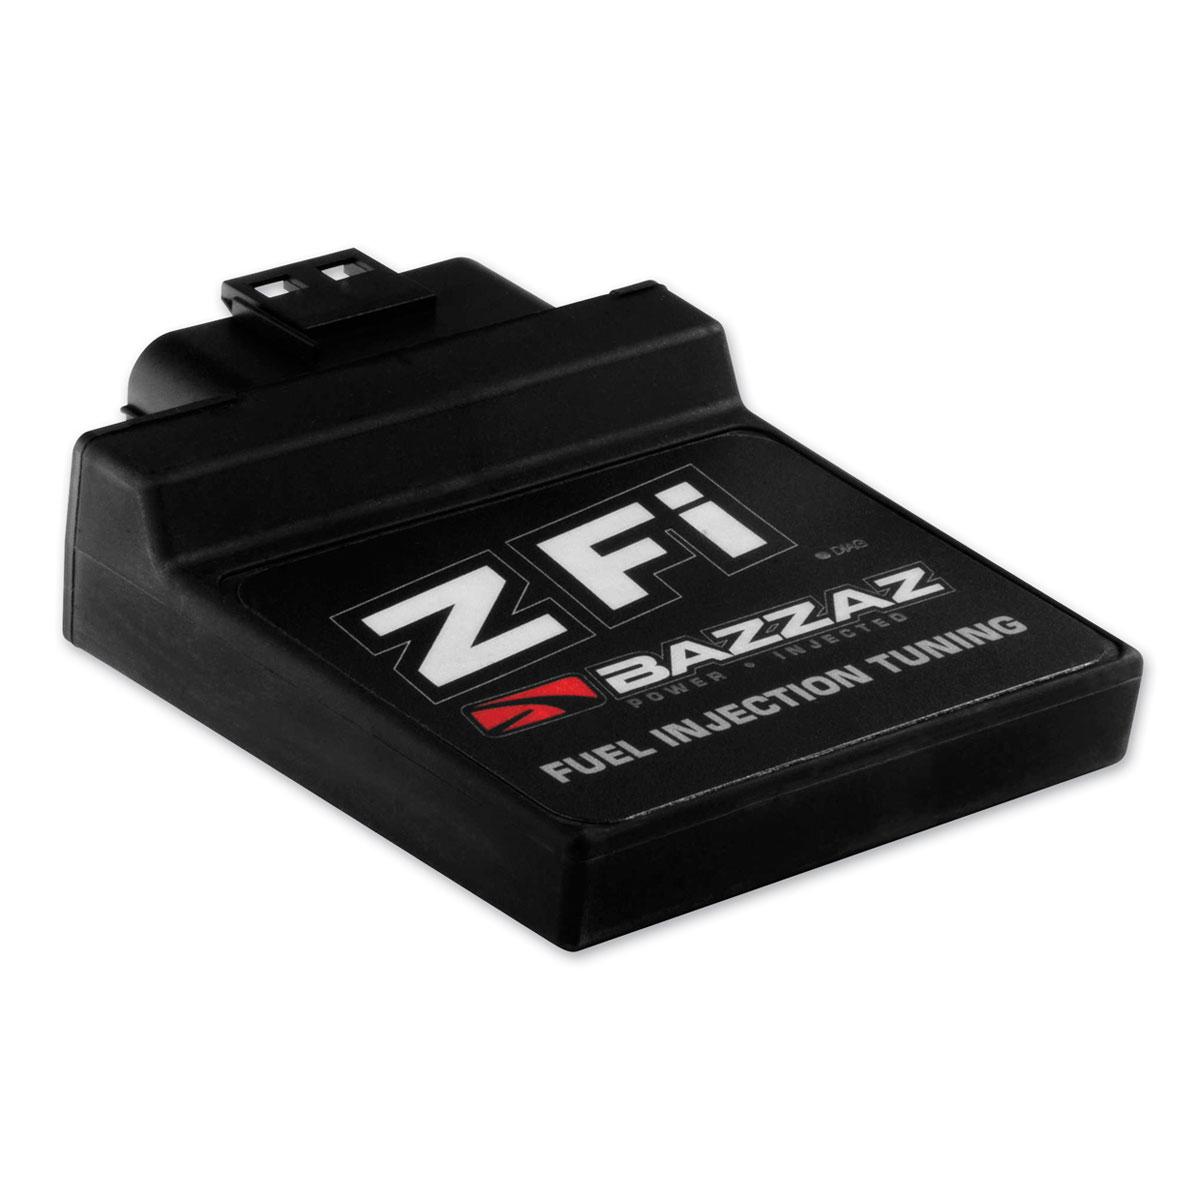 Bazzaz Z-FI Engine Management Fuel Control systems